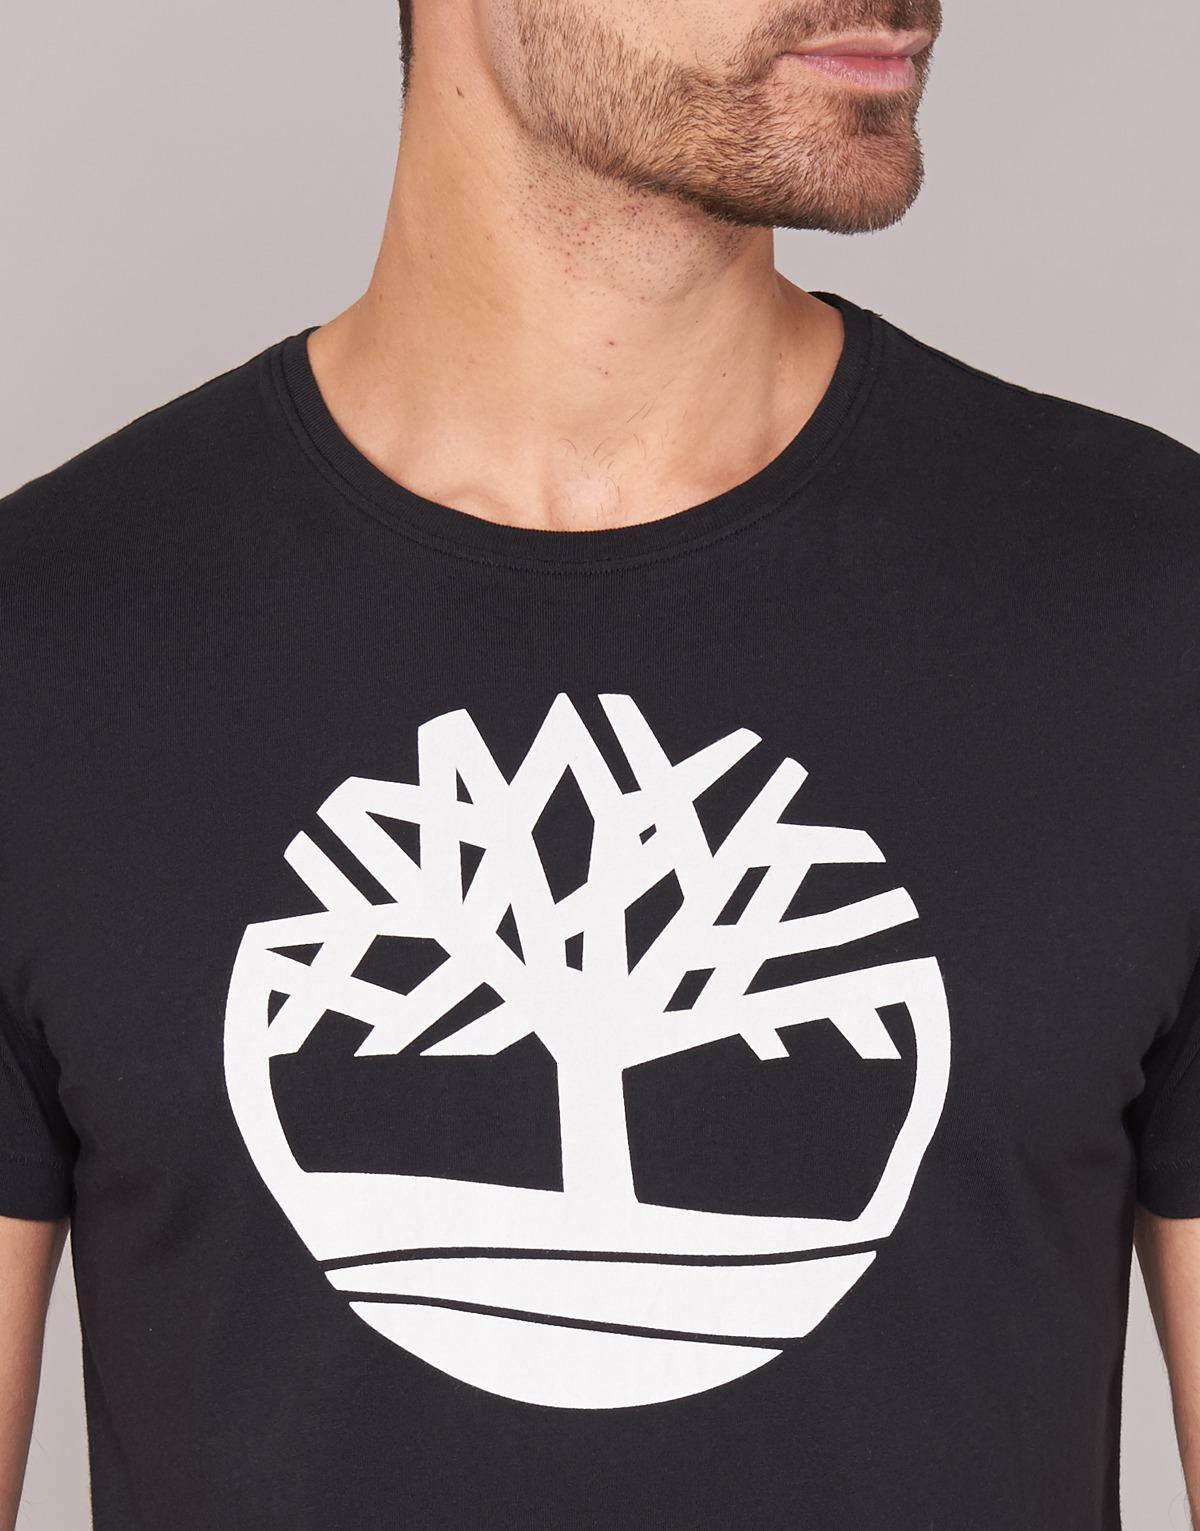 Ss Kennebec River Brand Tree Tee Men's T Shirt In Black